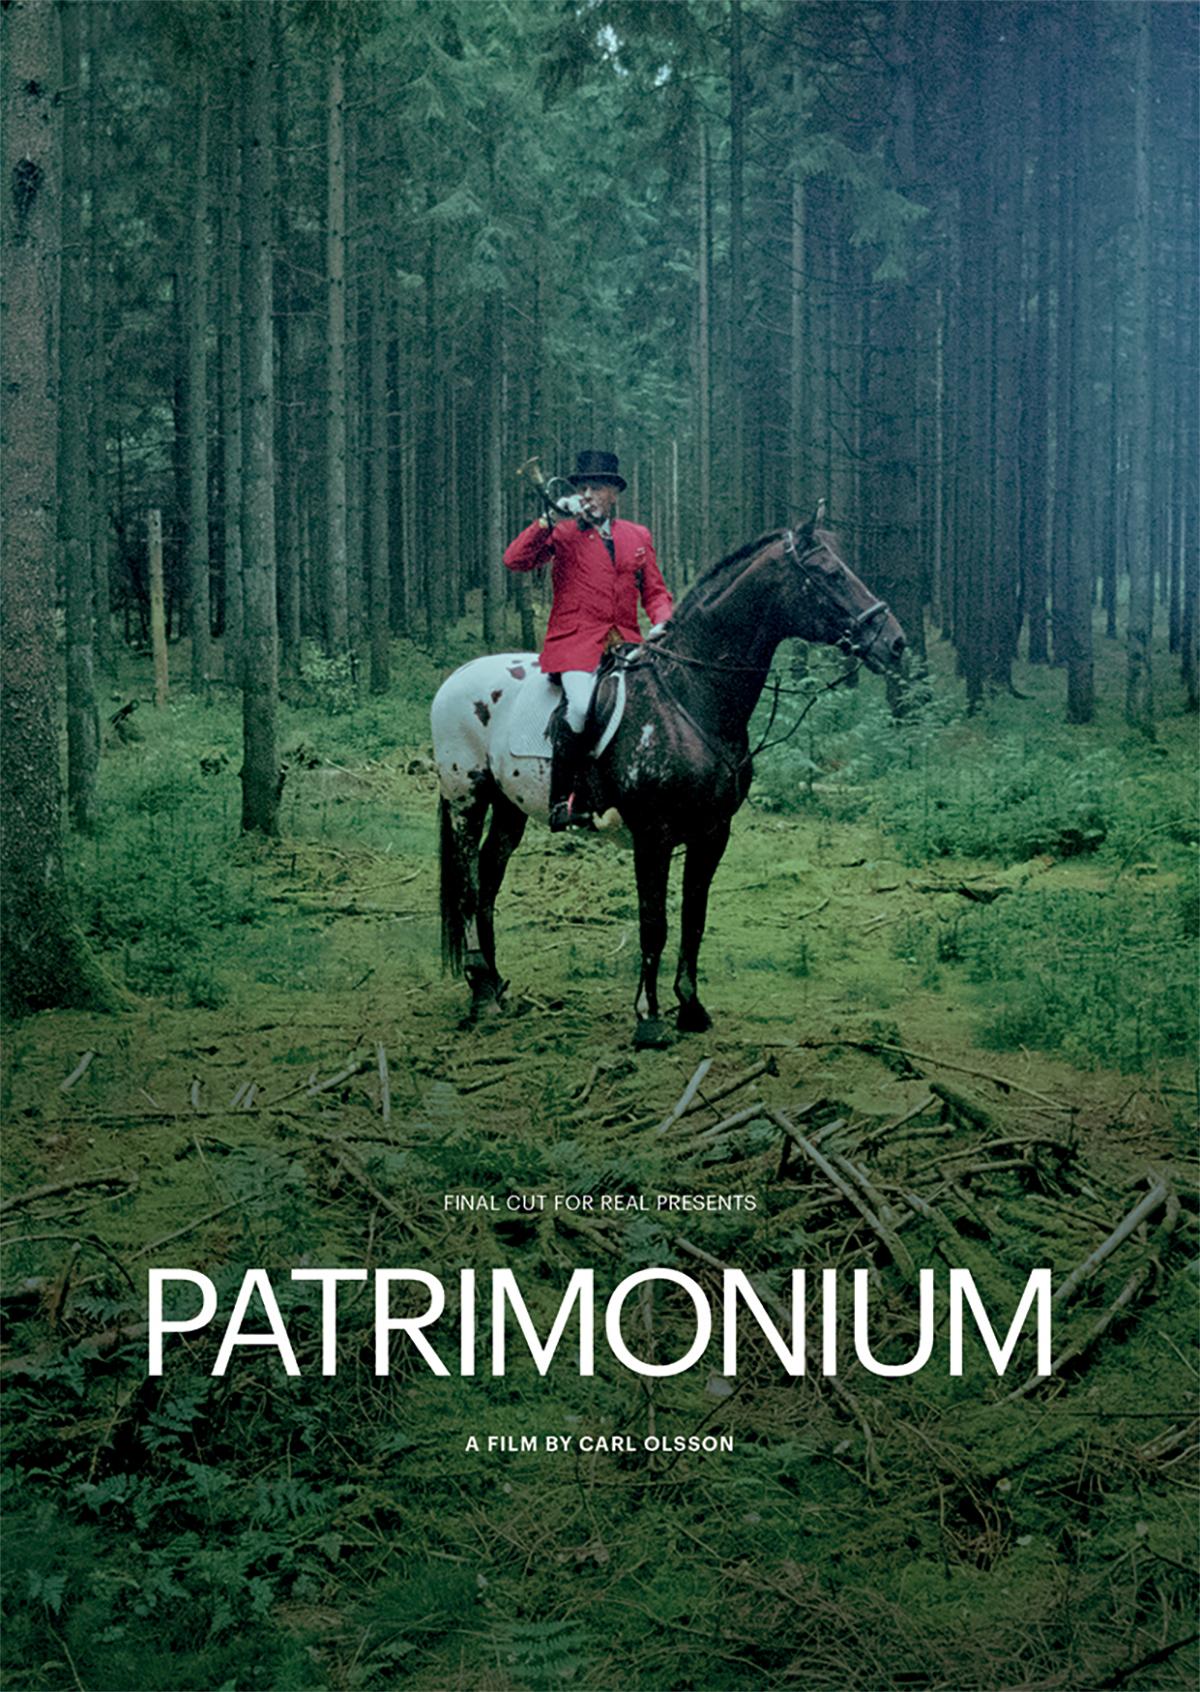 PostcardPatrimonium300rgbresize.jpg